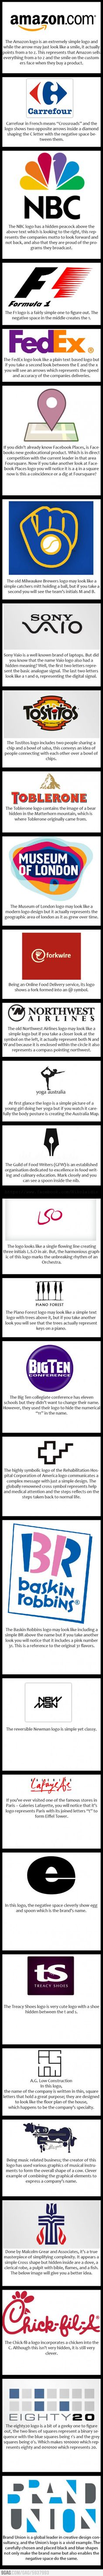 30 logos with hidden messages